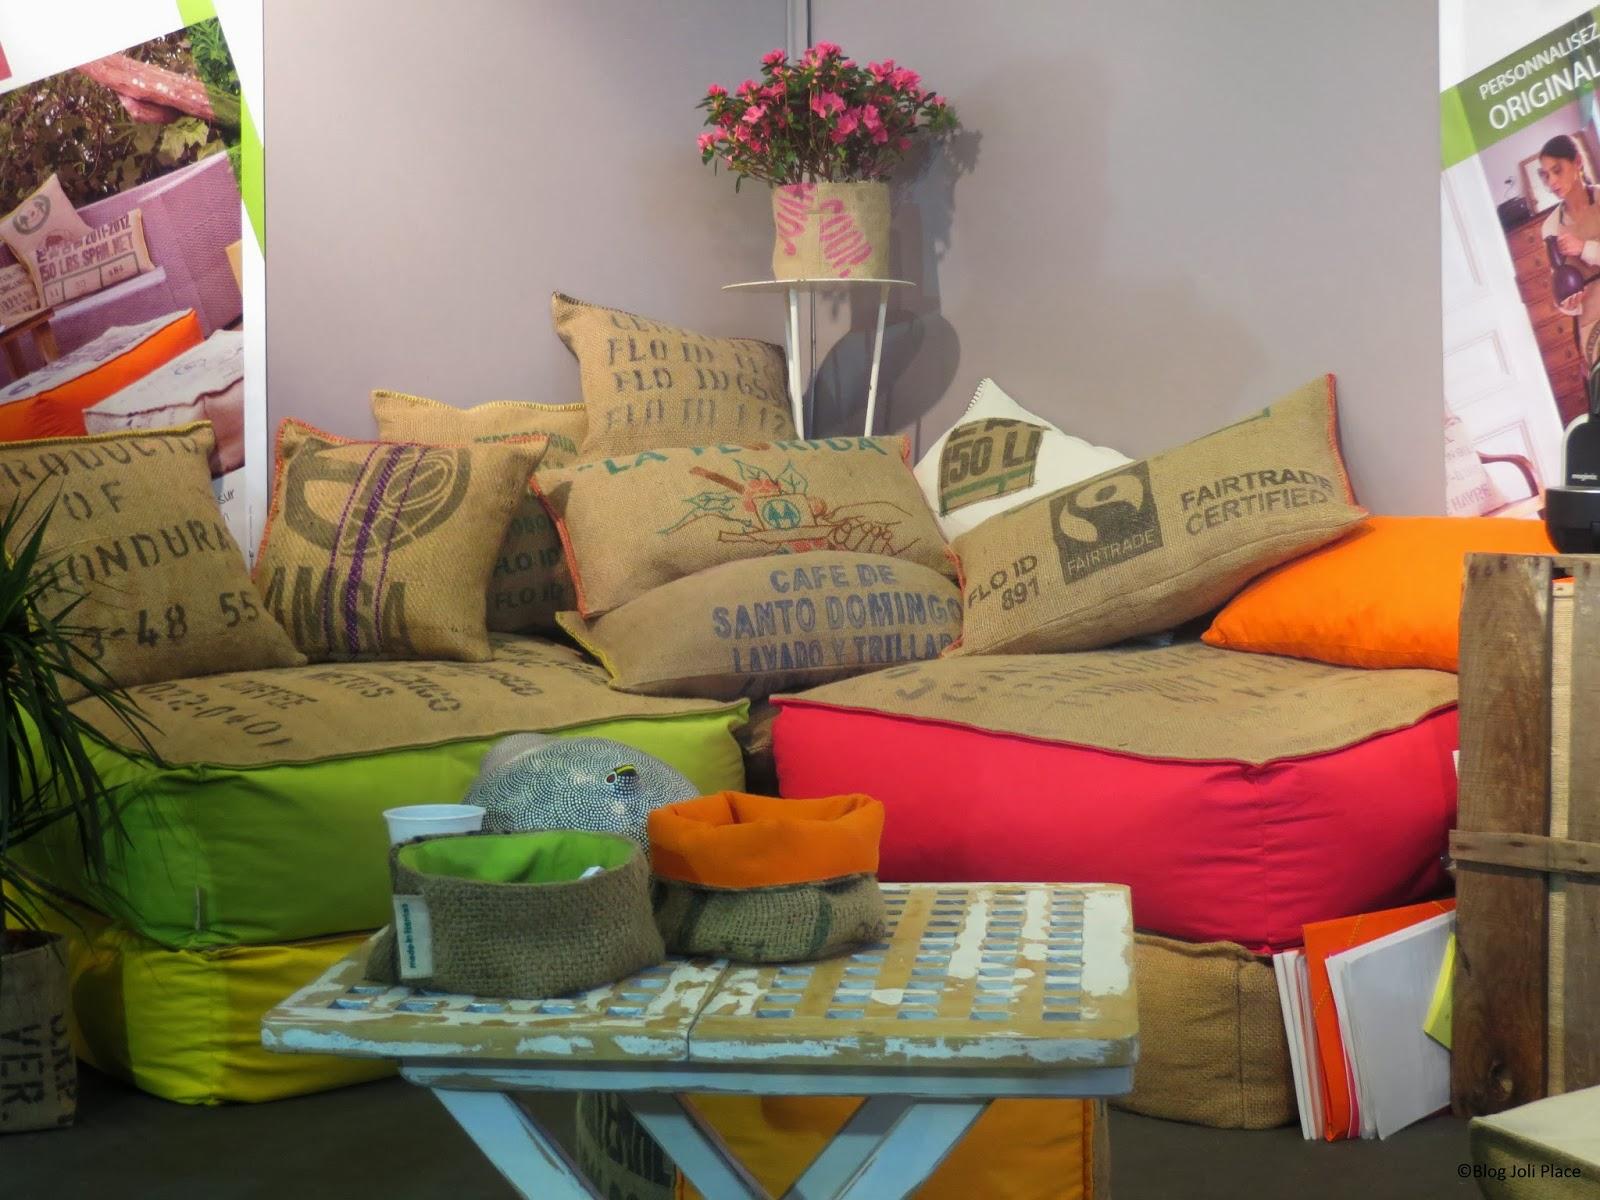 cabane indigo objets world design pour esprits voyageurs relations publiques pro. Black Bedroom Furniture Sets. Home Design Ideas